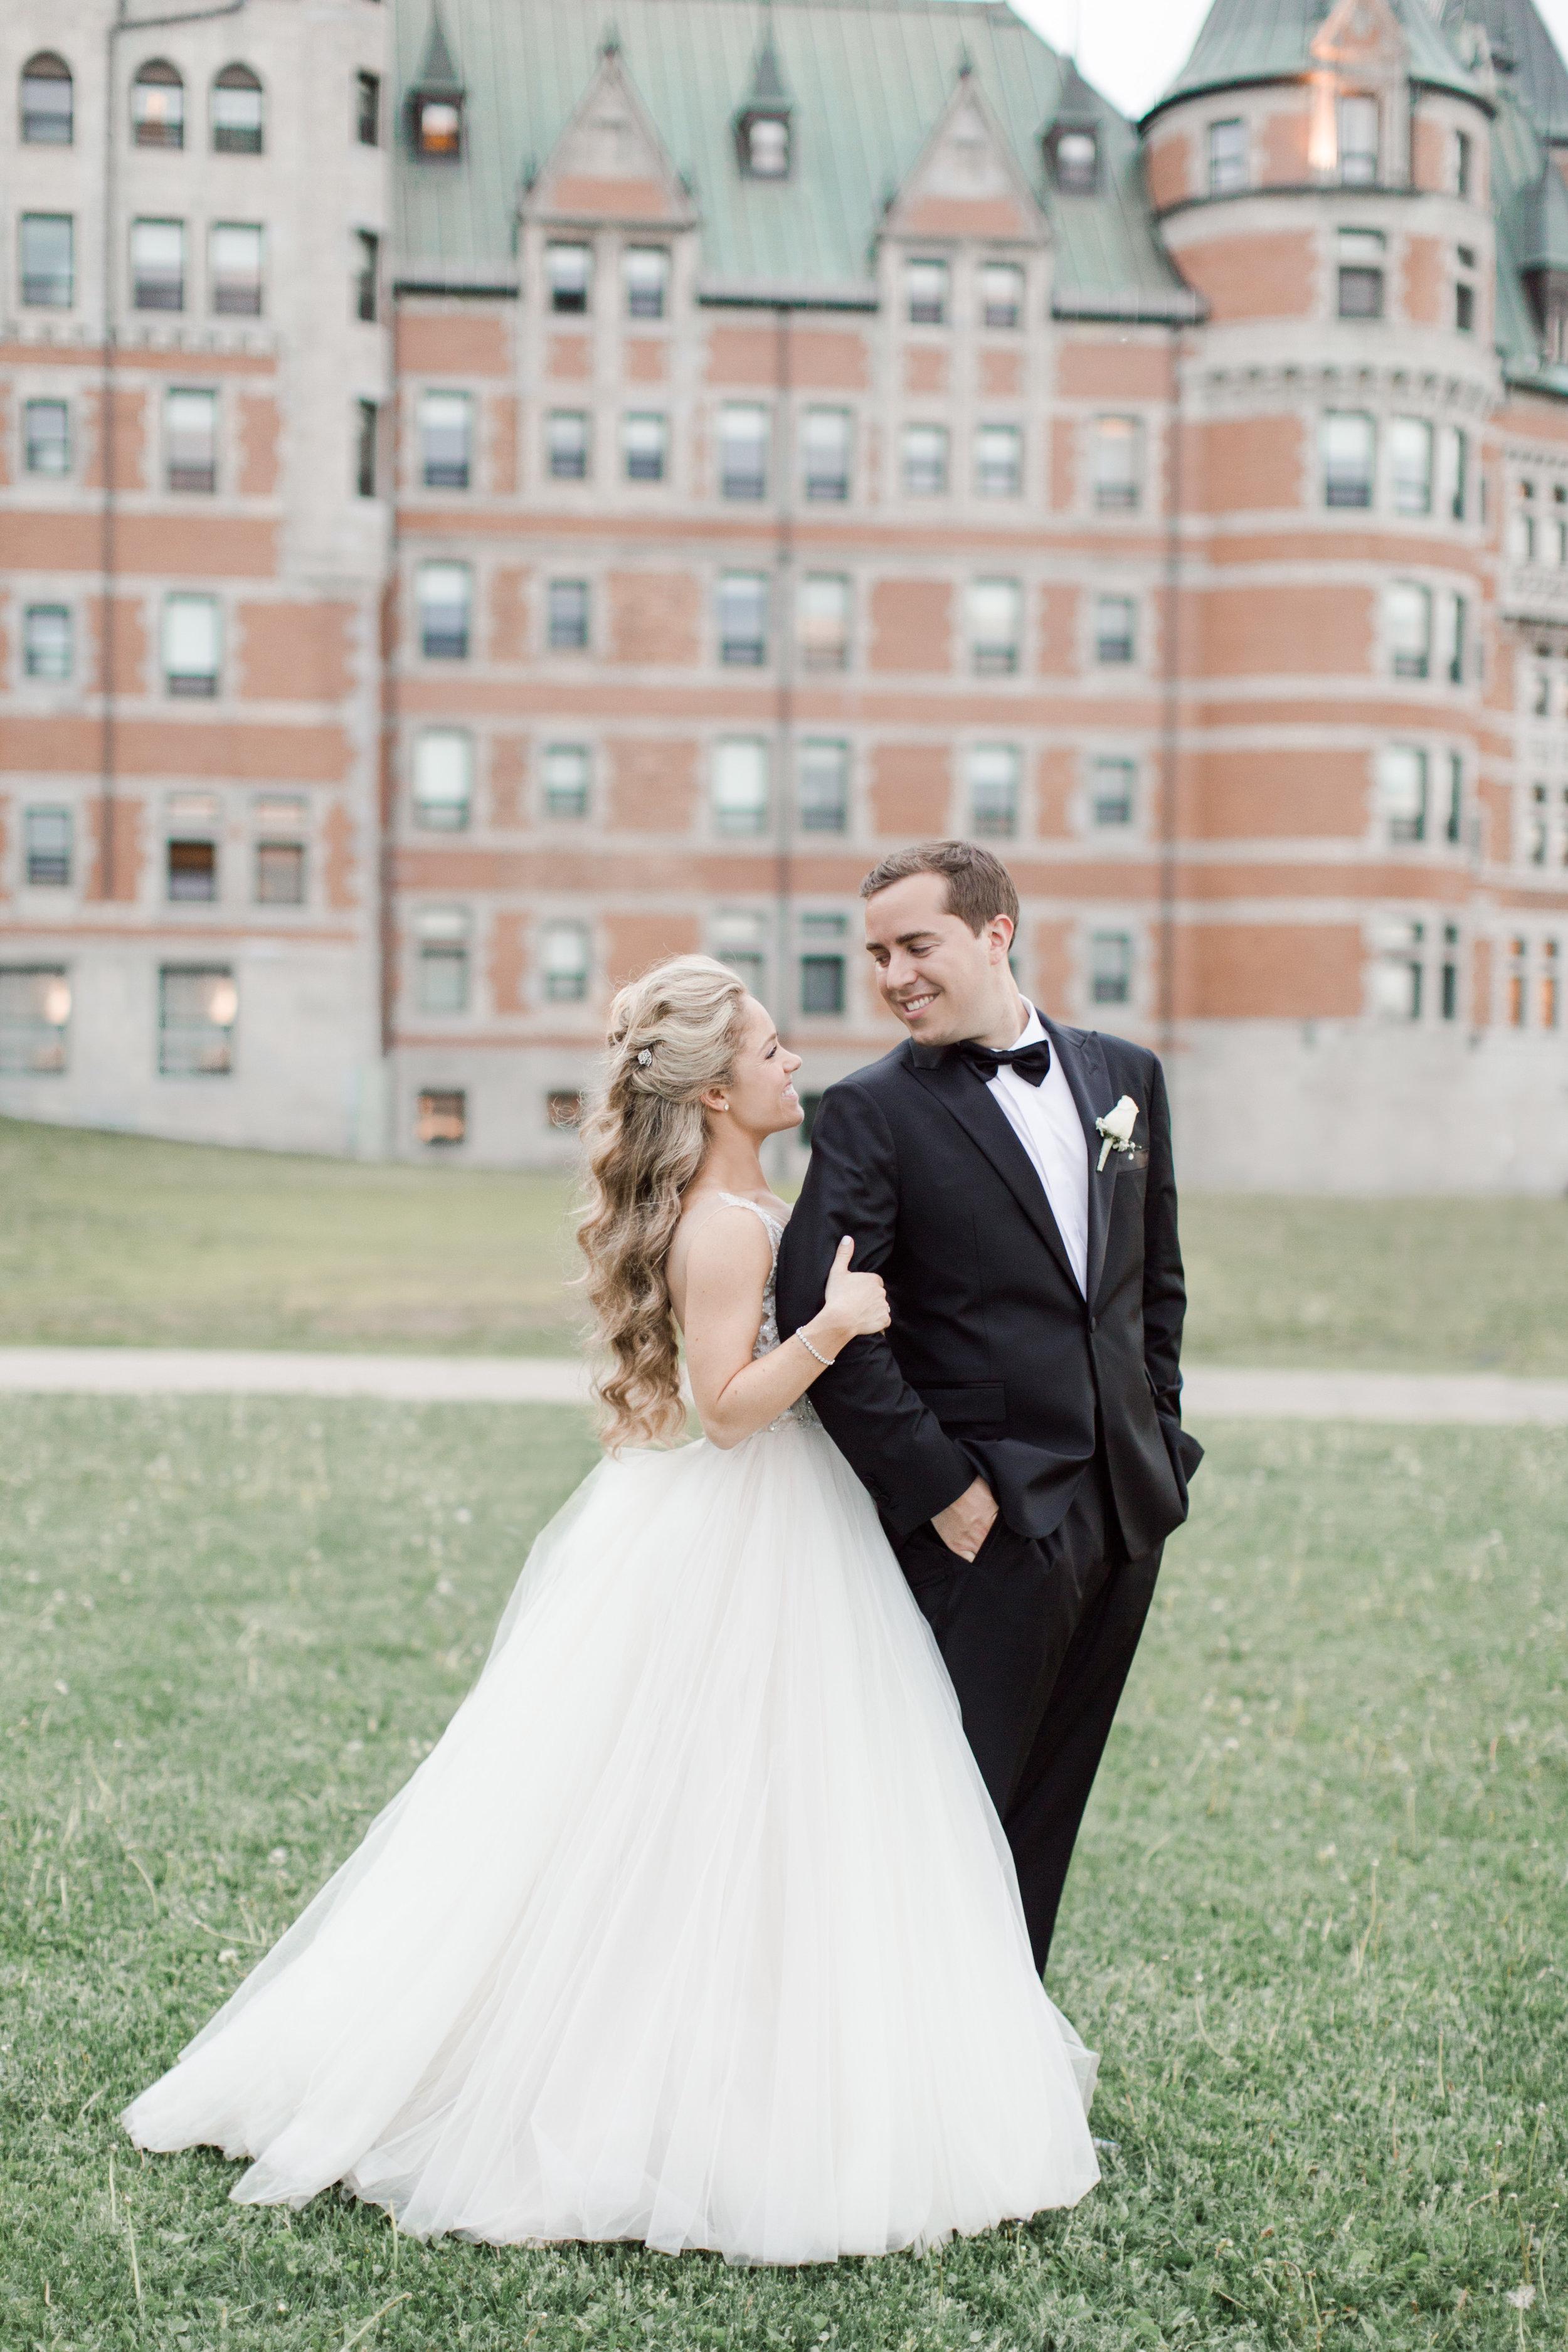 toronto-ontario-wedding-photographer-heidi-elliott-previews-20b.jpg